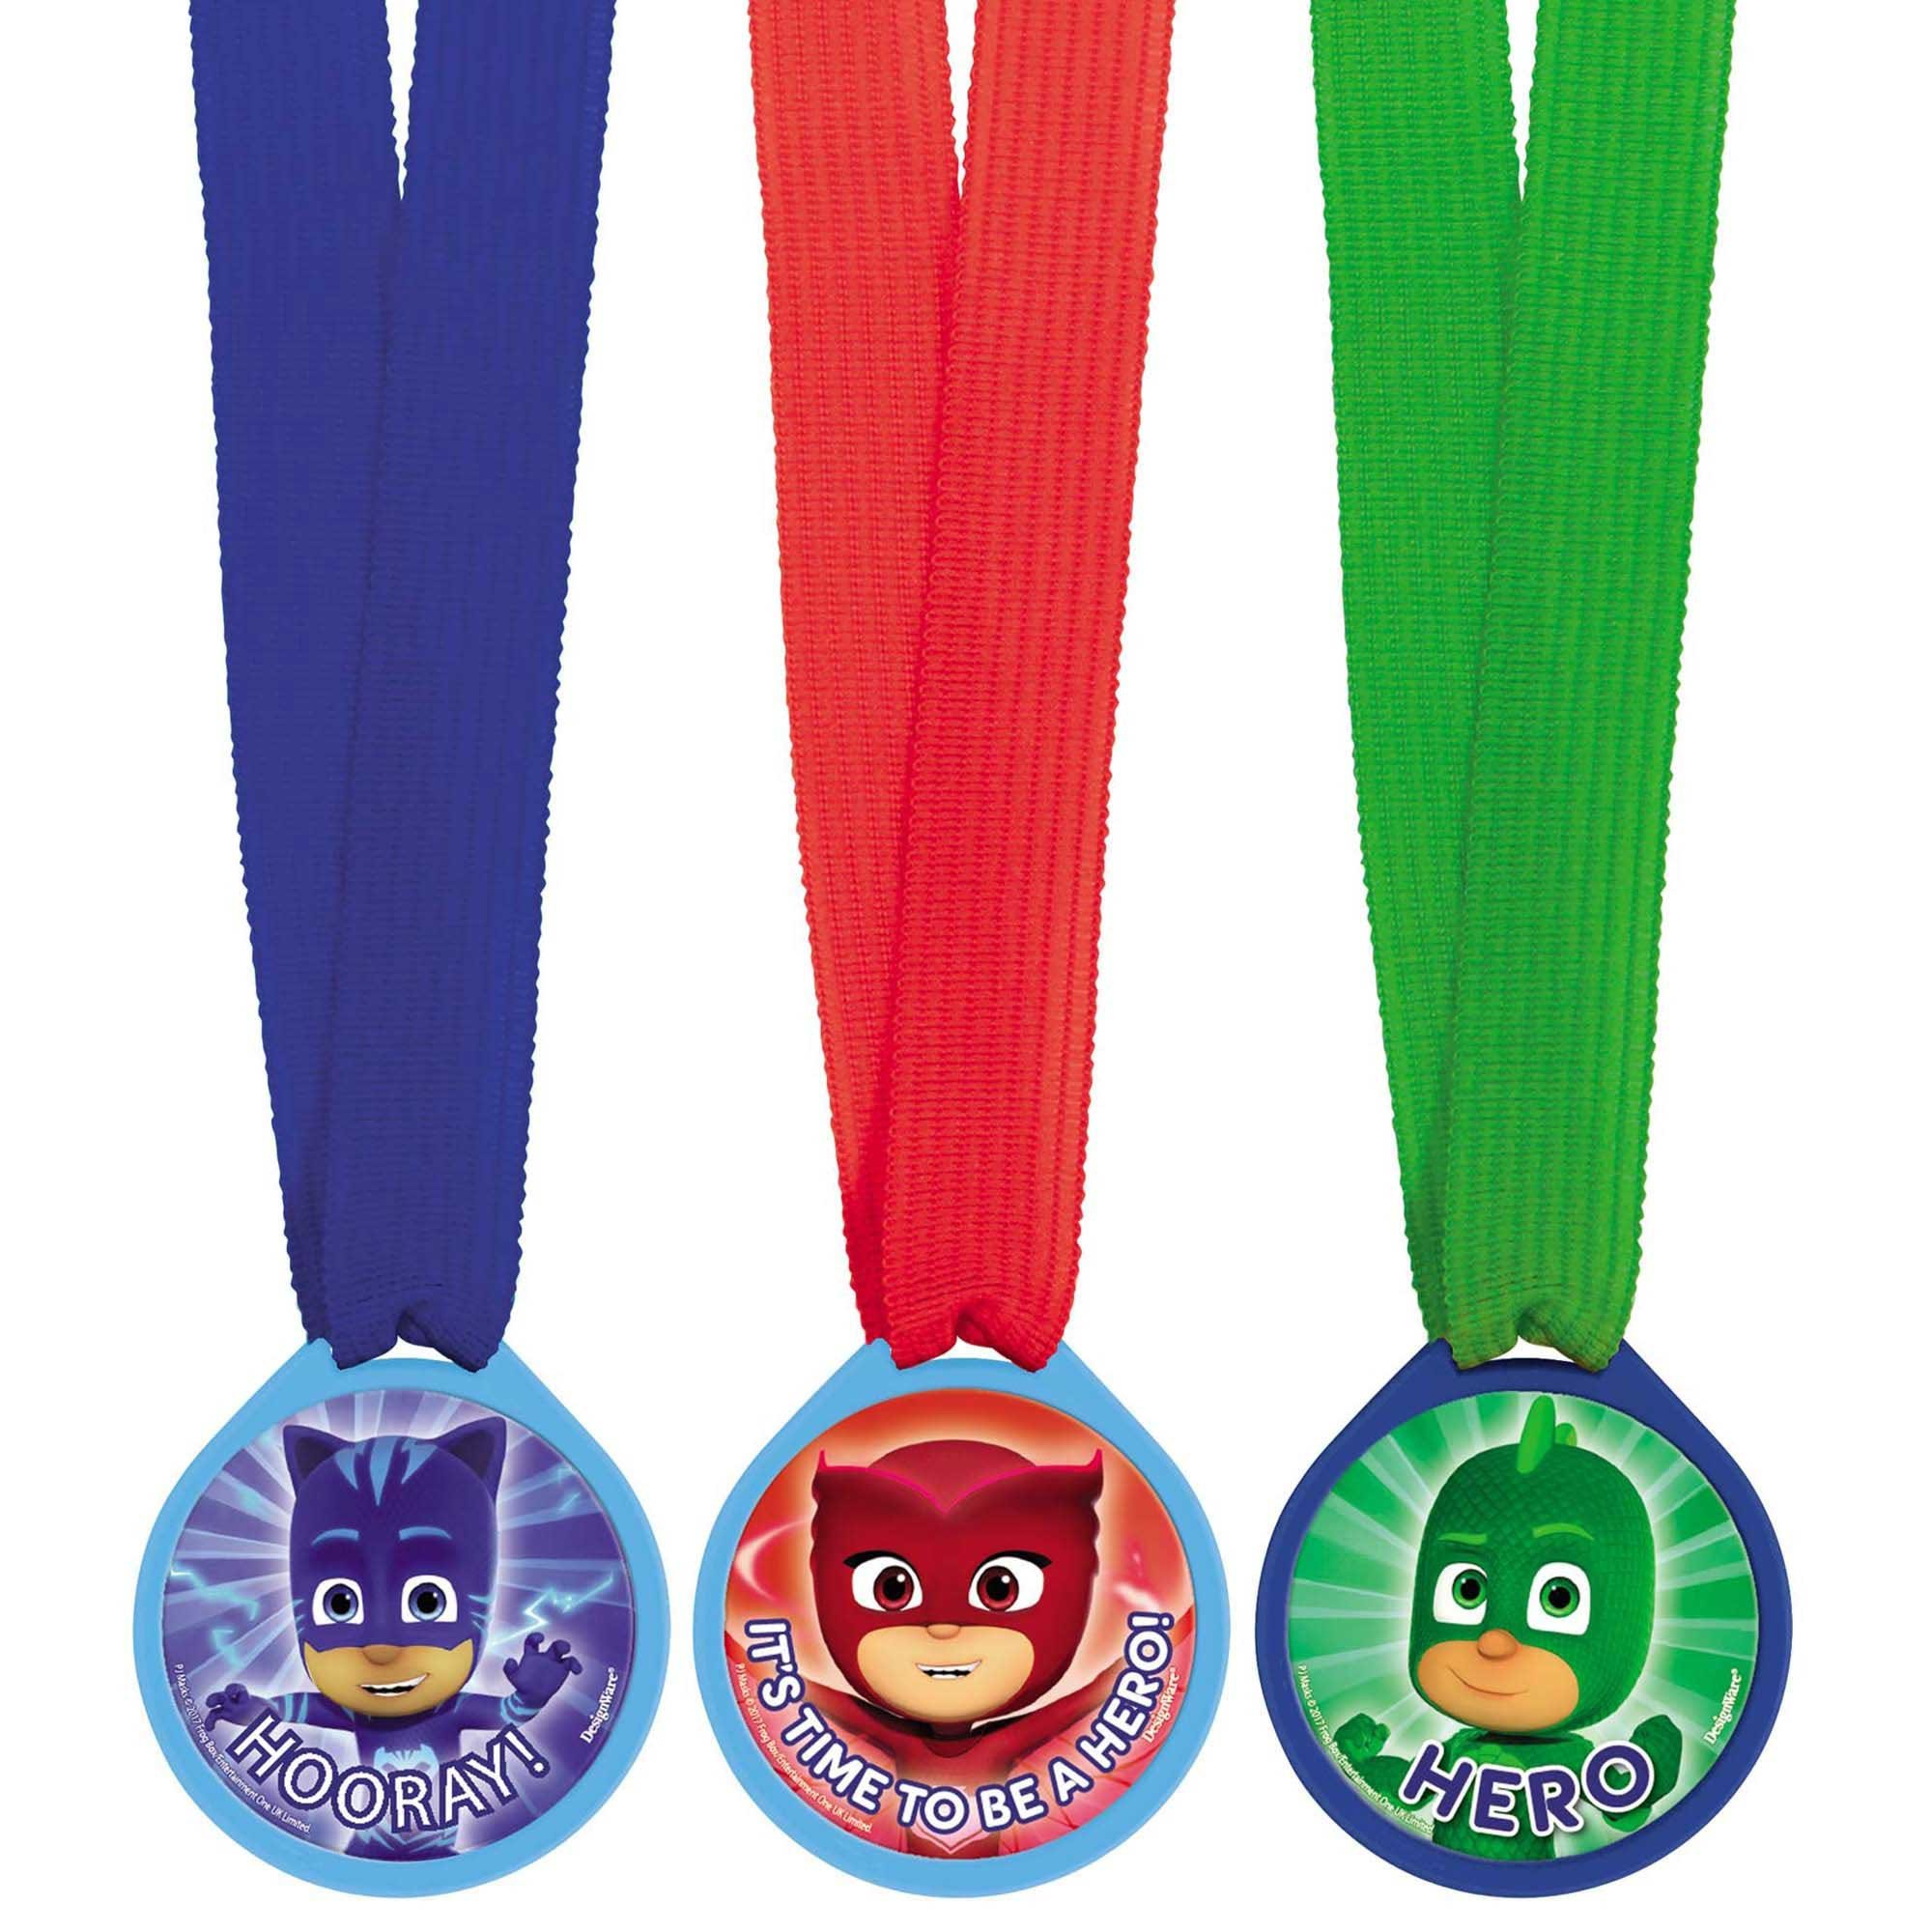 PJ Masks Mini Award Medals Favor